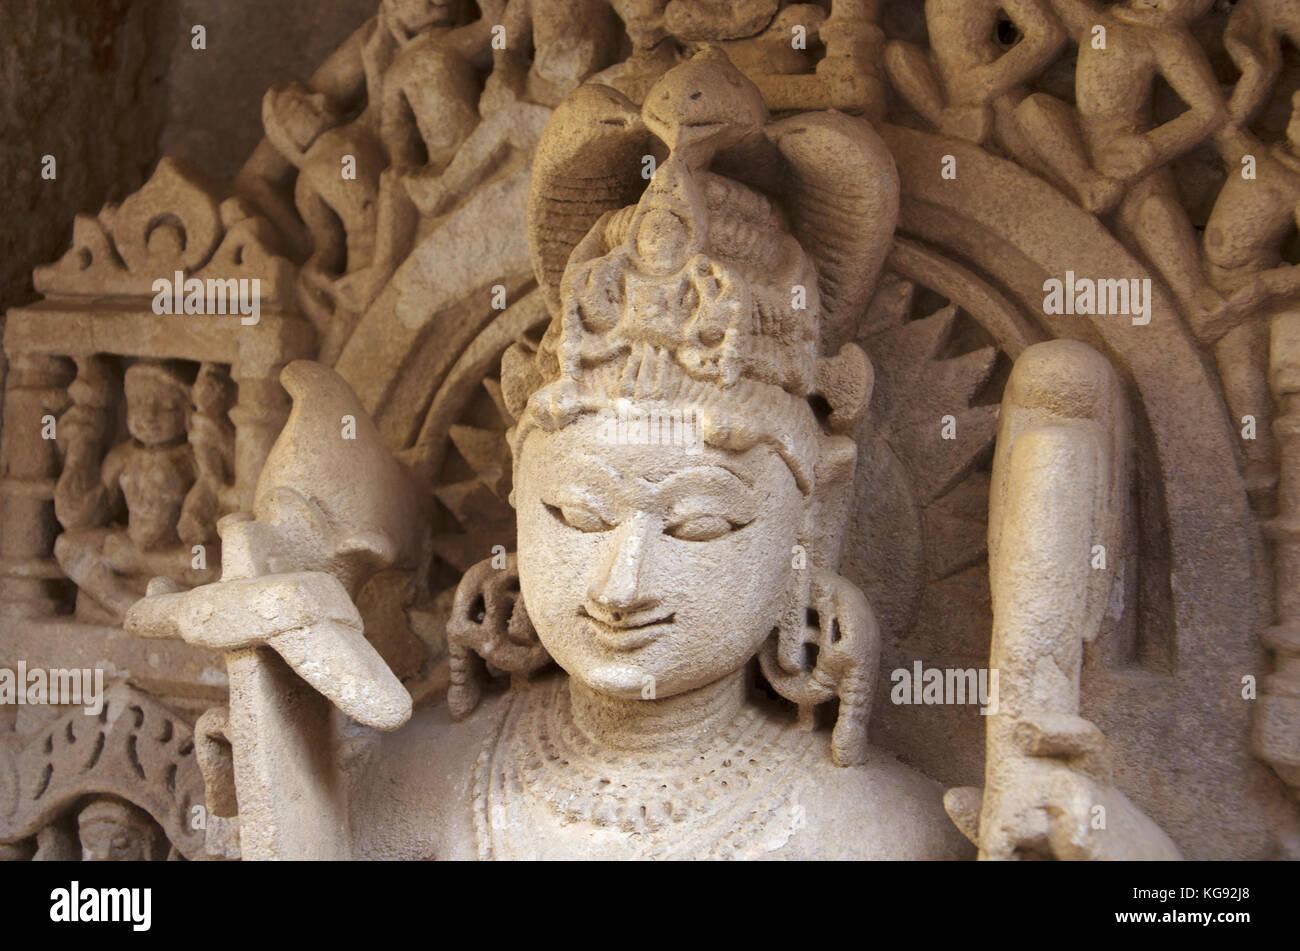 Balarama Sculpture closeup, Inner wall of Rani ki vav, an intricately constructed stepwell on the banks of Saraswati - Stock Image